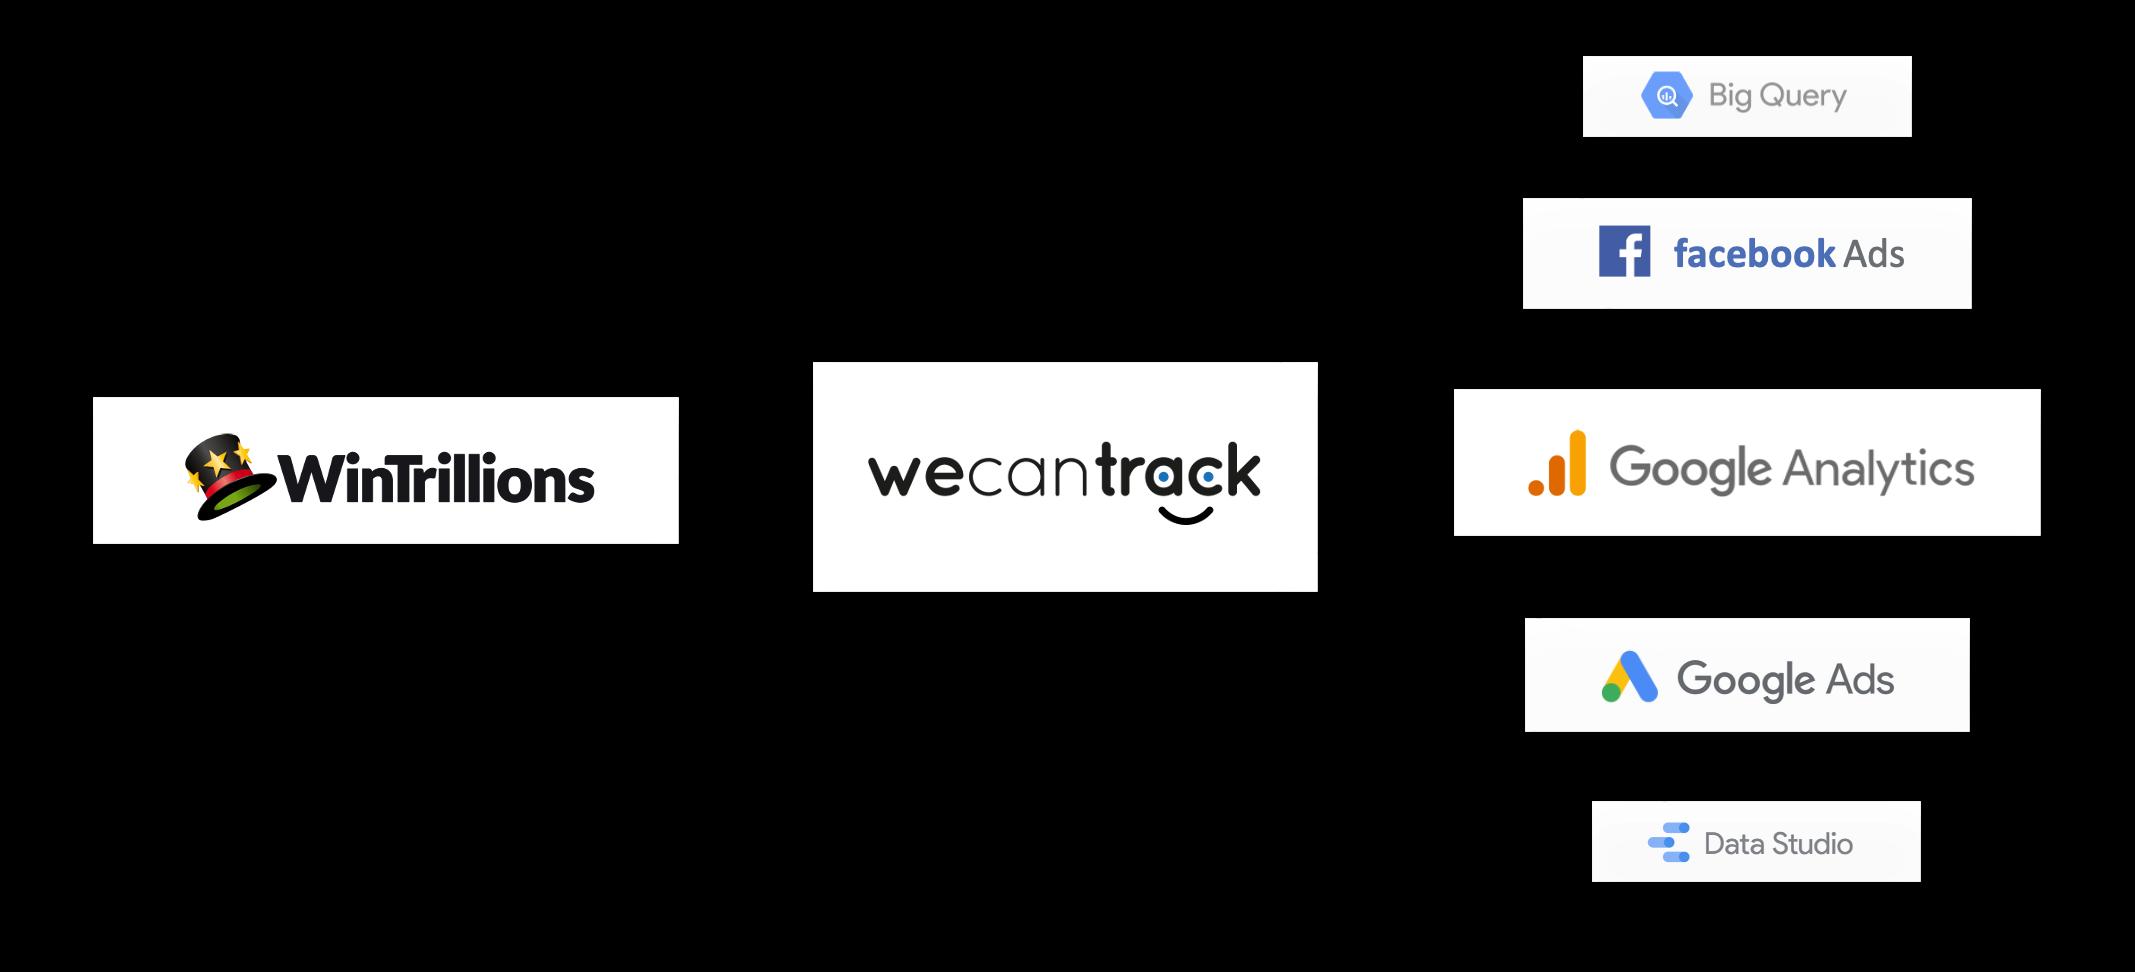 integrate-wintrillions-affiliate-conversions-via-postback